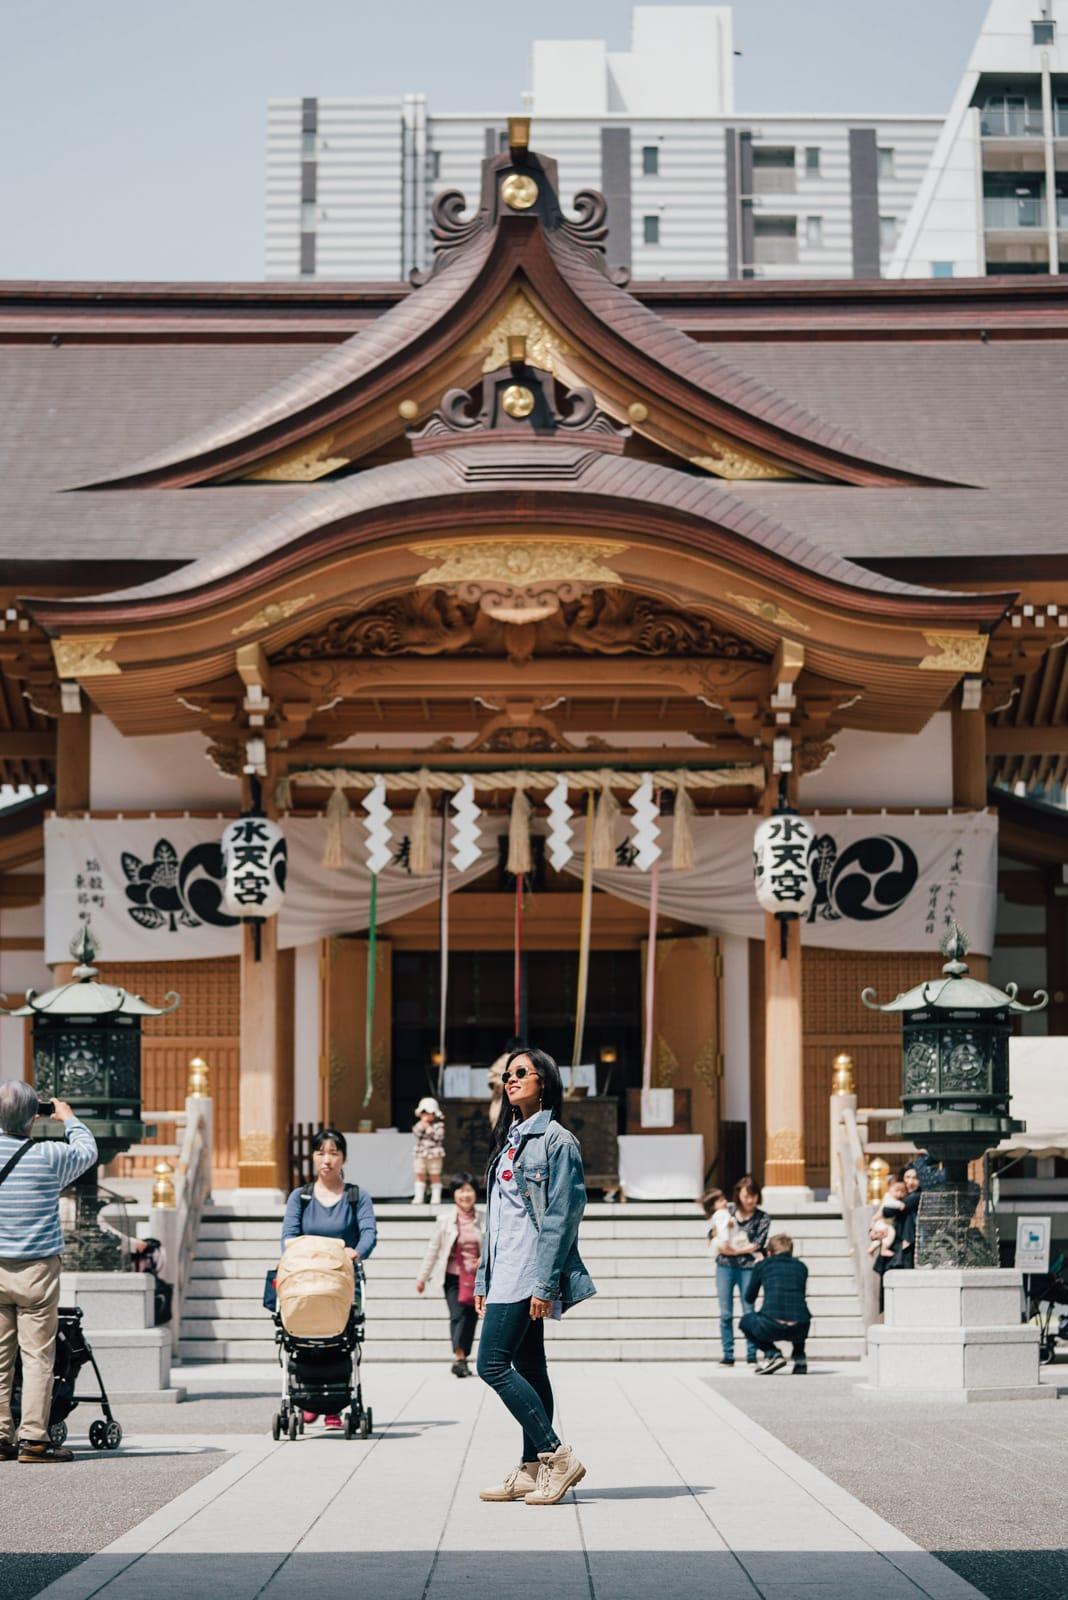 ningyocho tokyo, ningyocho, nihonbashi, ningyocho hotels, nihonbashi hotels, ningyocho things to do, Suitengu Shrine